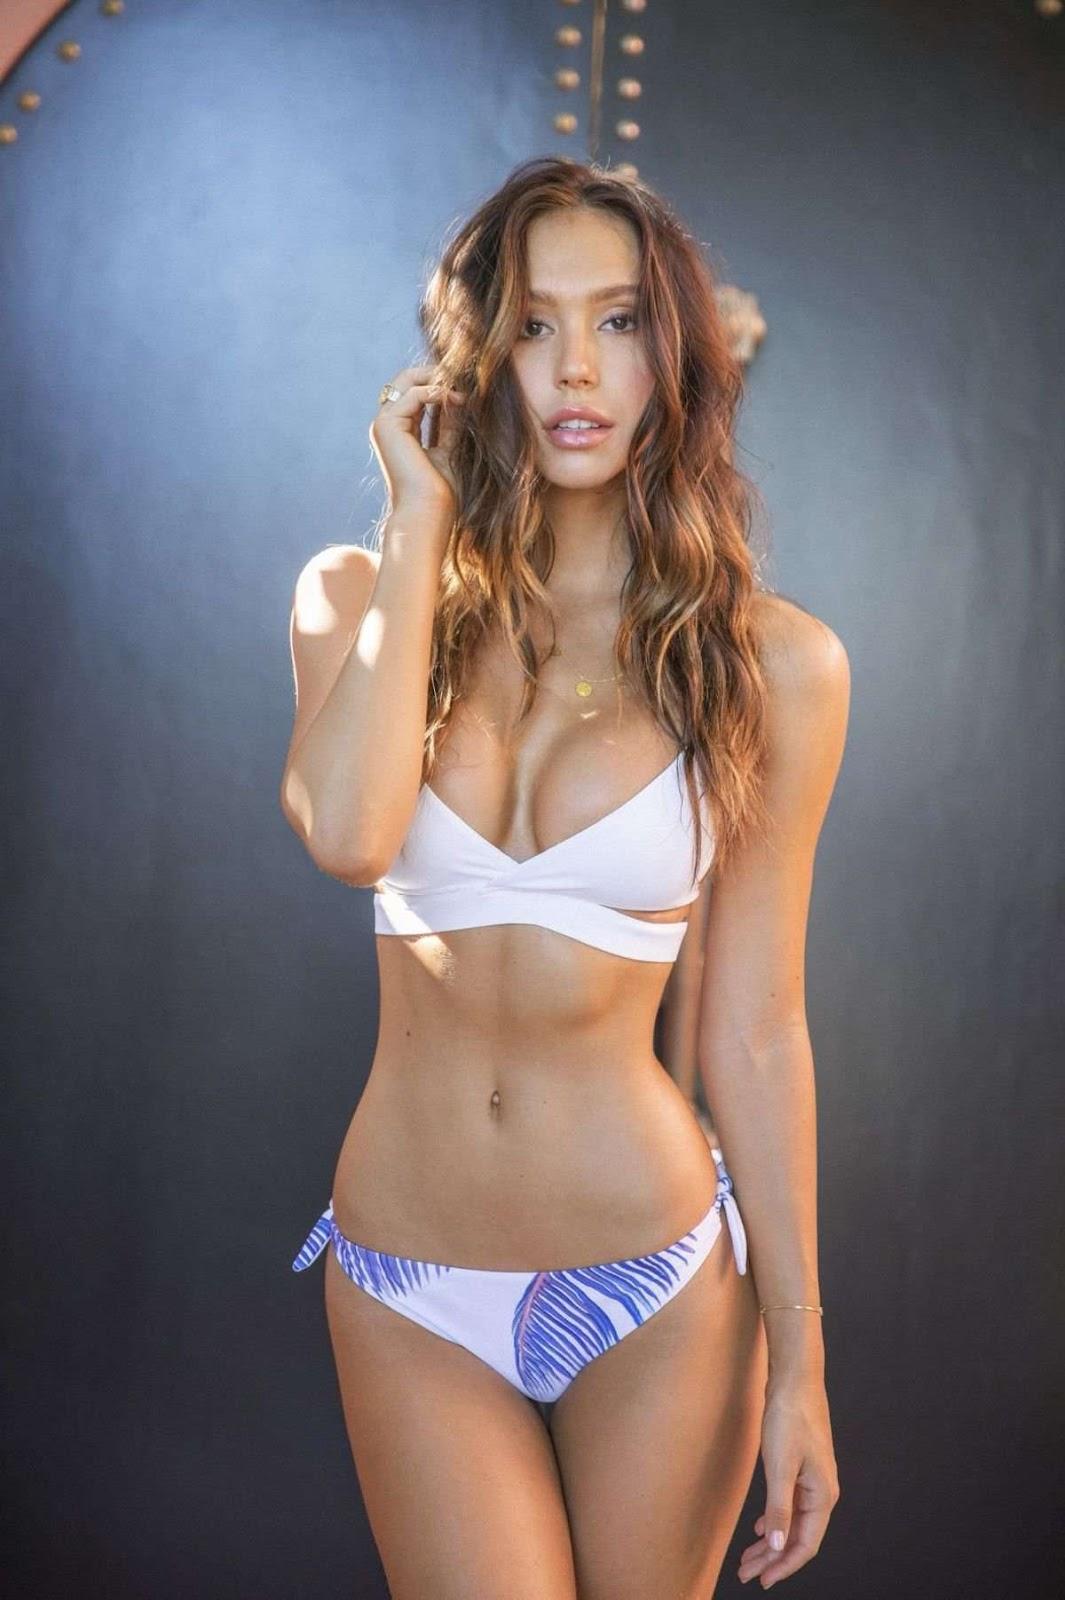 Alexis Ren – Alexia Stam 2019 Swimwear